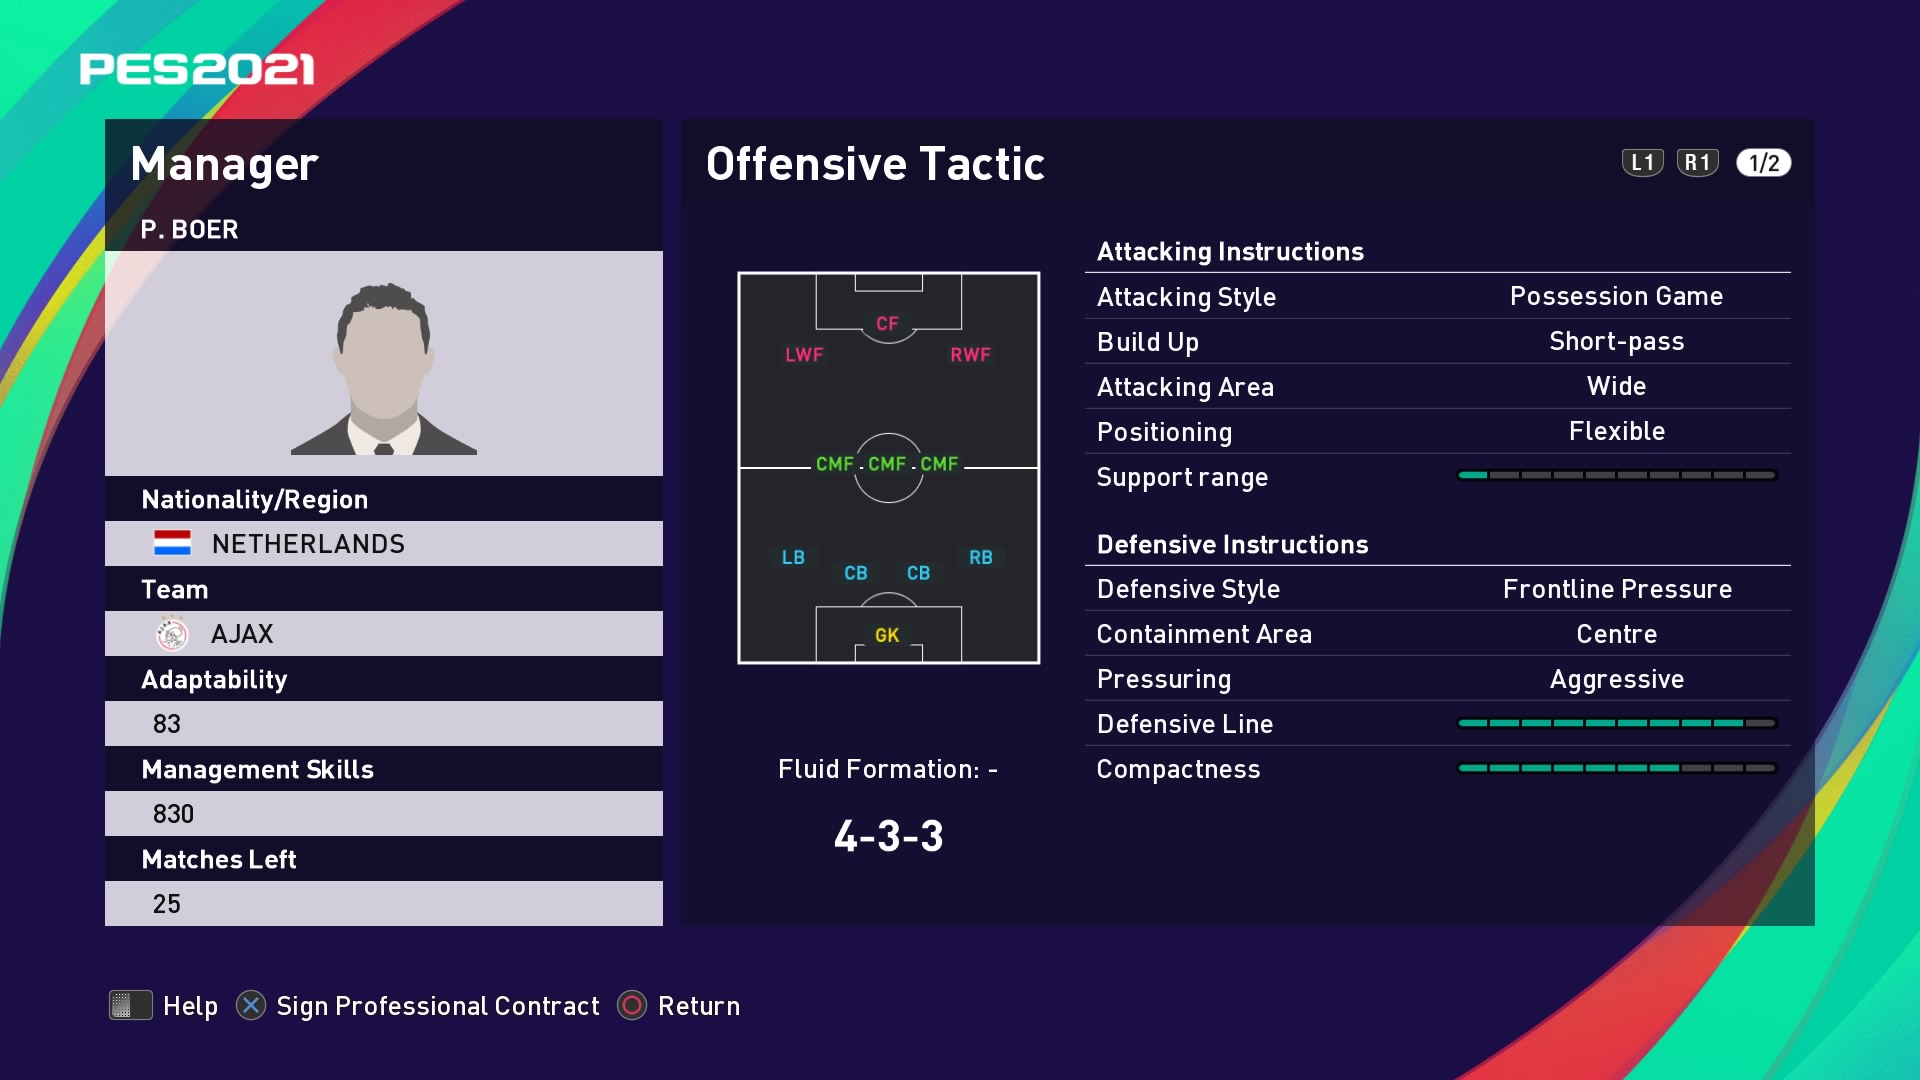 P. Boer (2) (Erik ten Hag) Offensive Tactic in PES 2021 myClub